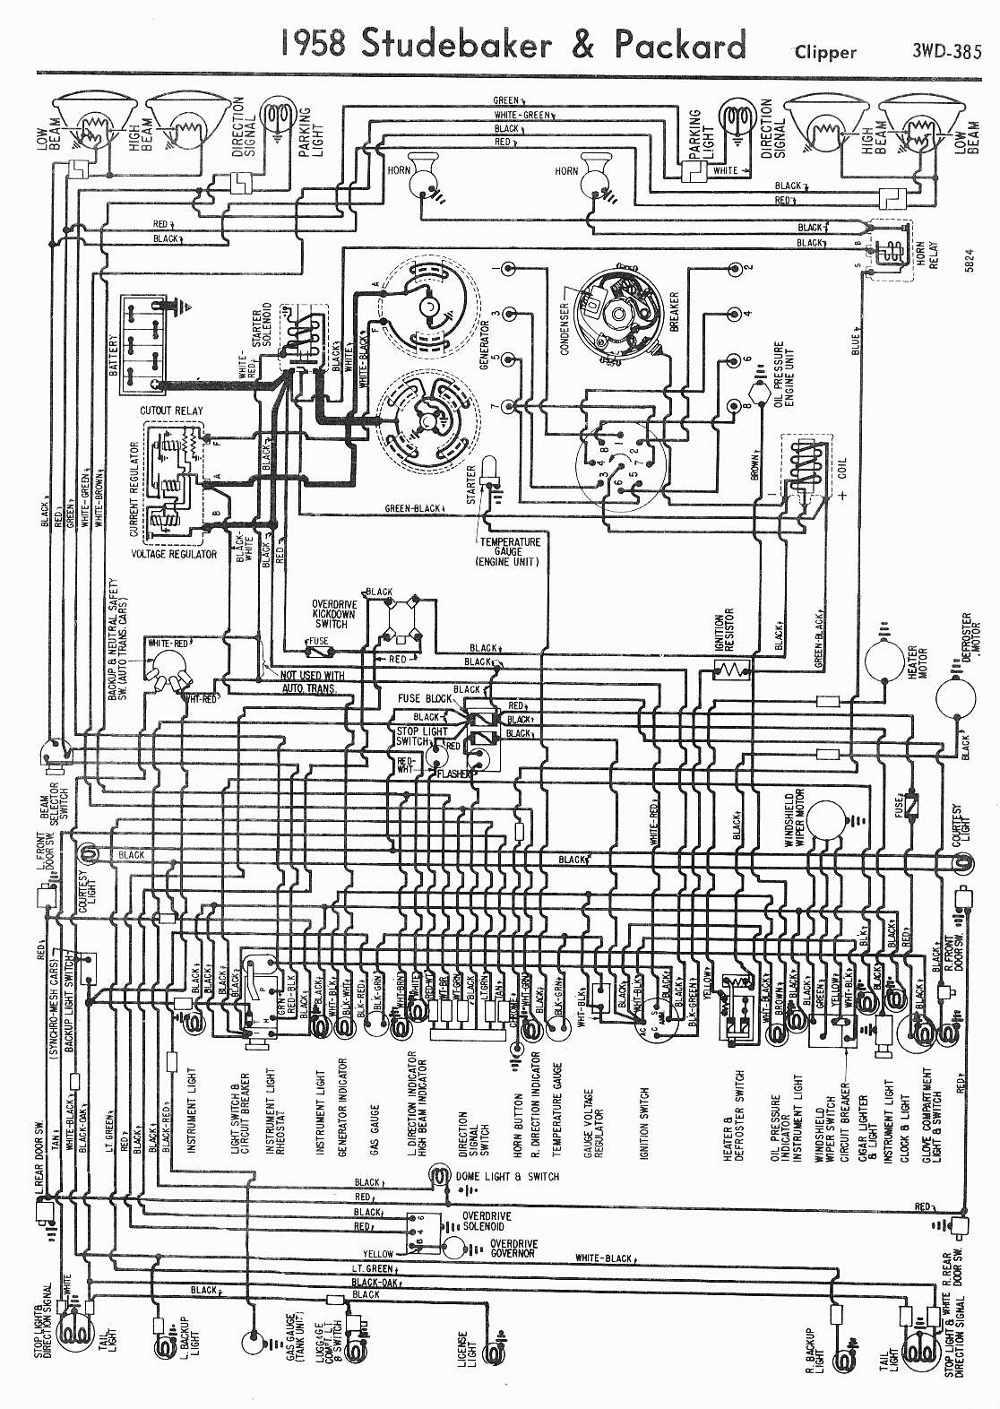 1955 Packard Wiring Diagram Schematic Diagrams Dodge Truck 1948 Enthusiast U2022 Mercury